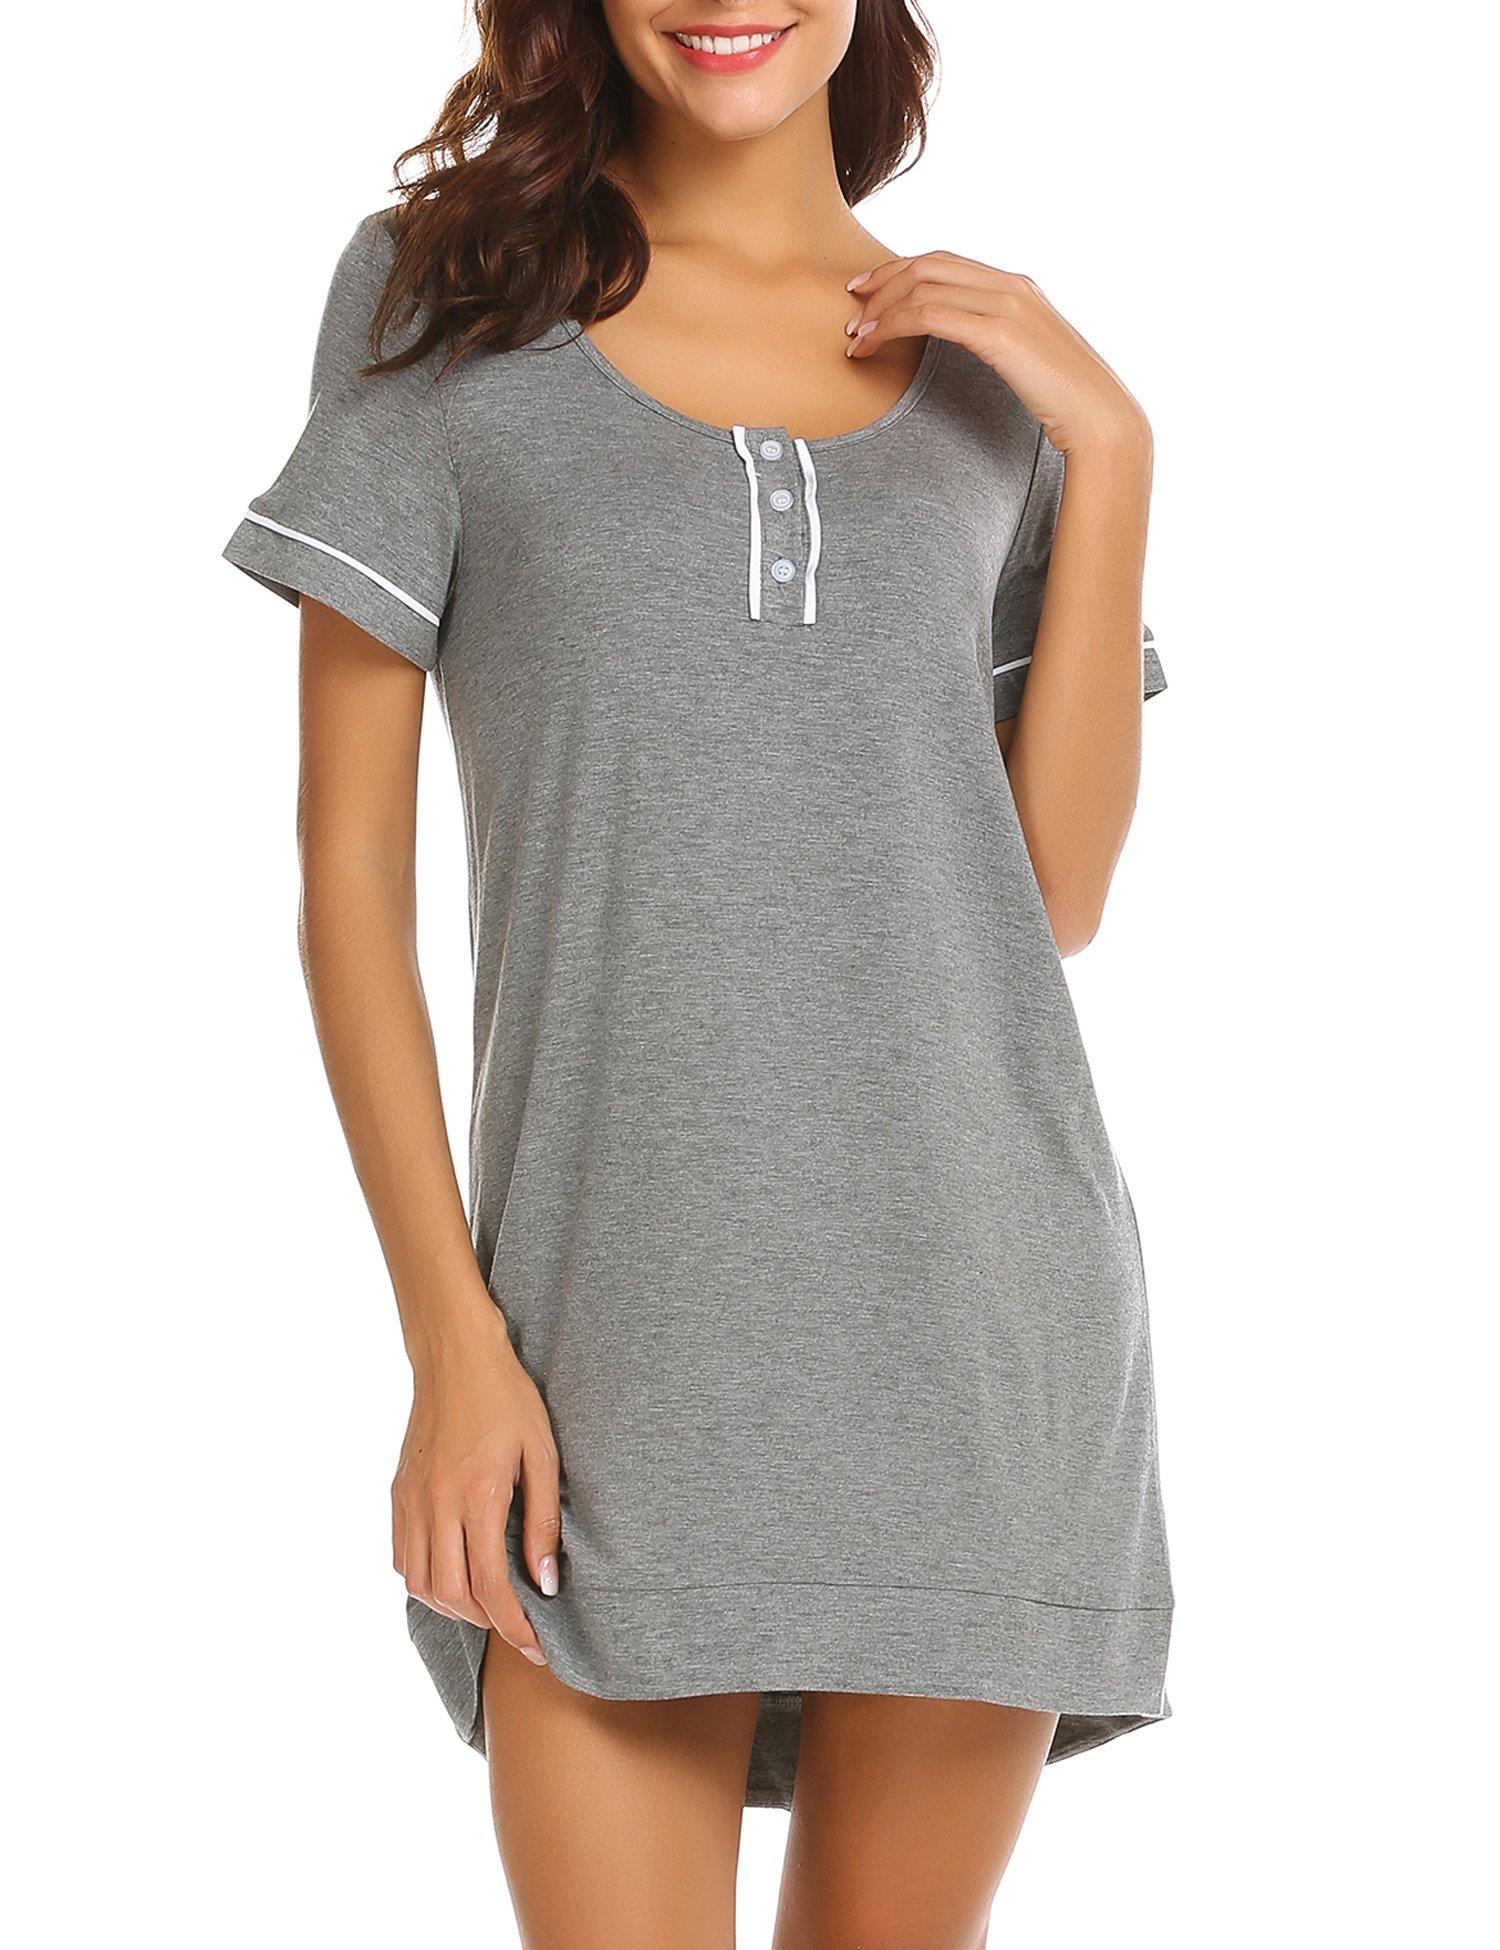 a09df94e8c Ekouaer Sleepwear Womens Plus Size Pajama Short Sleeve Cotton Soft Loose  Jersey Casual Slip Lingerie